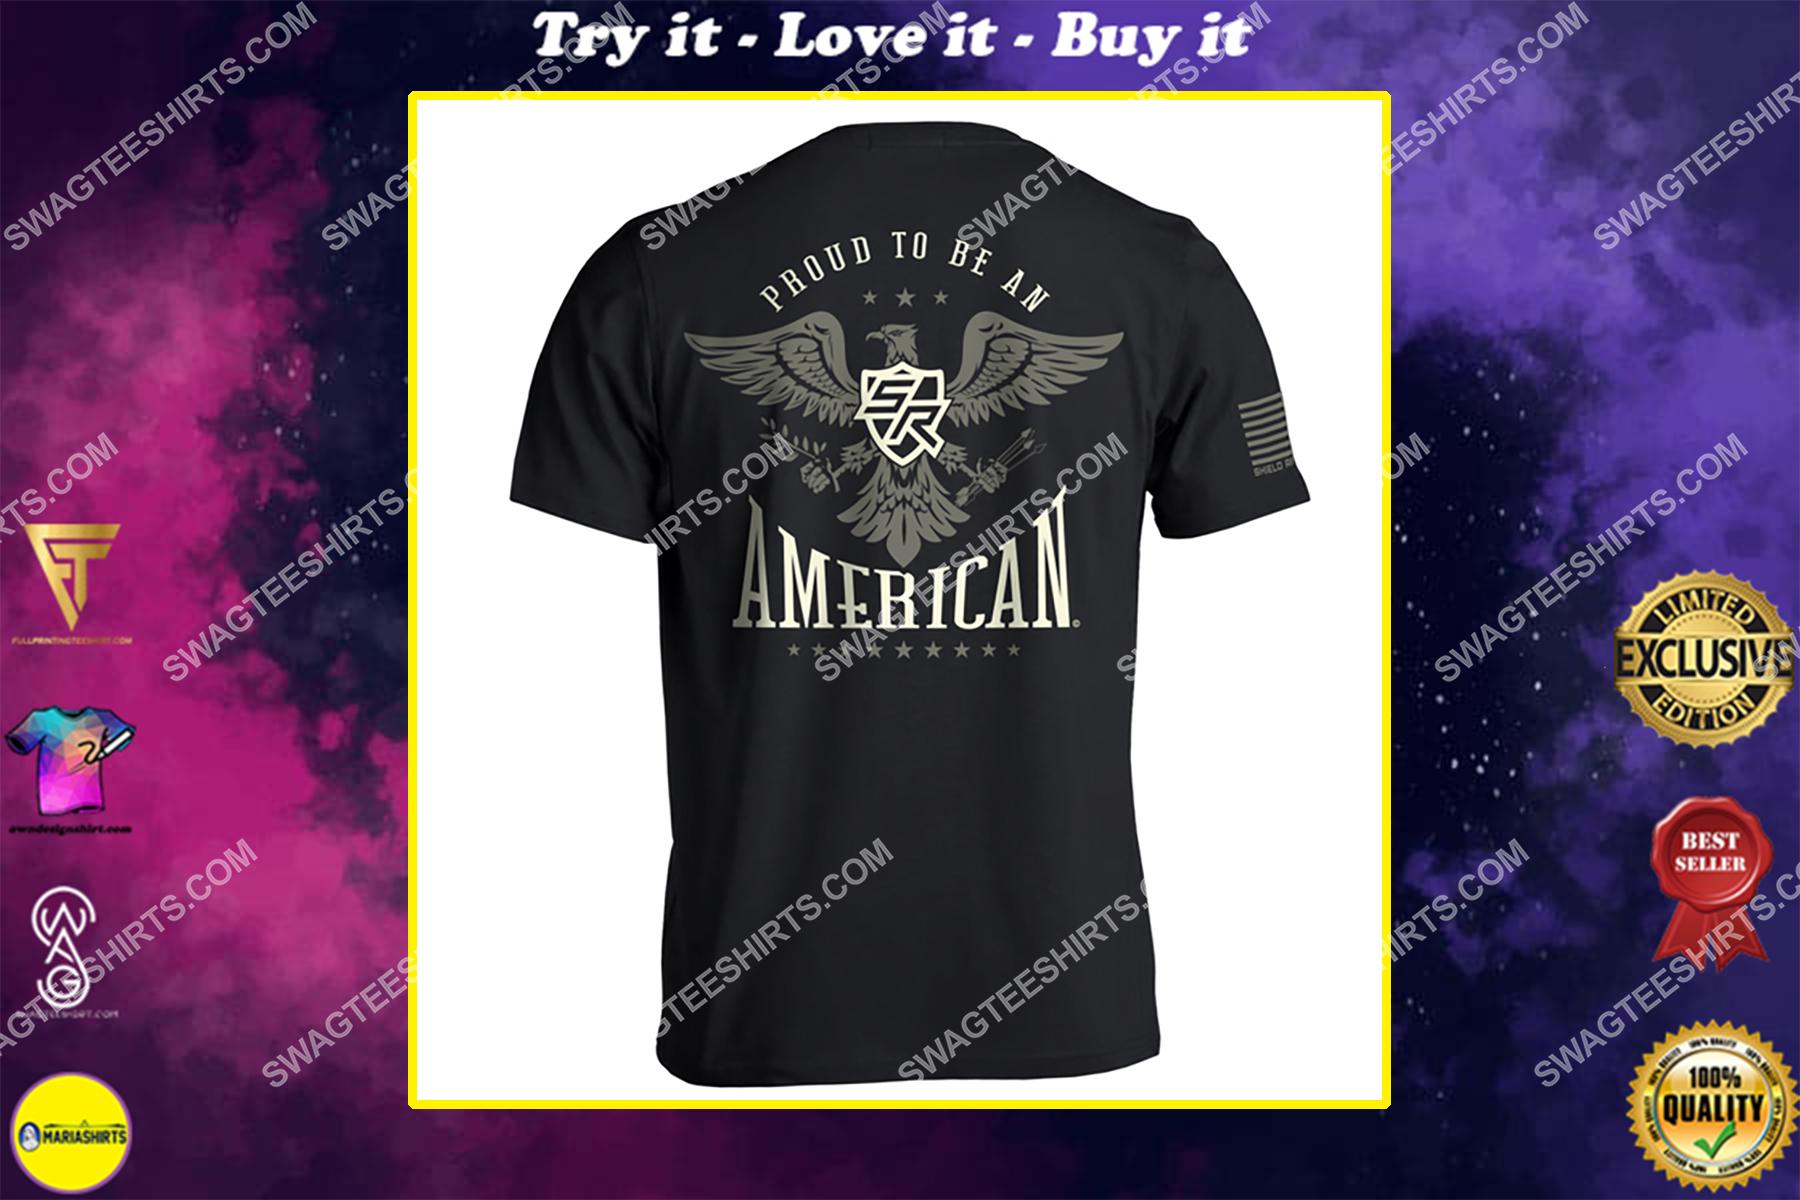 shield republic proud to be an american political shirt